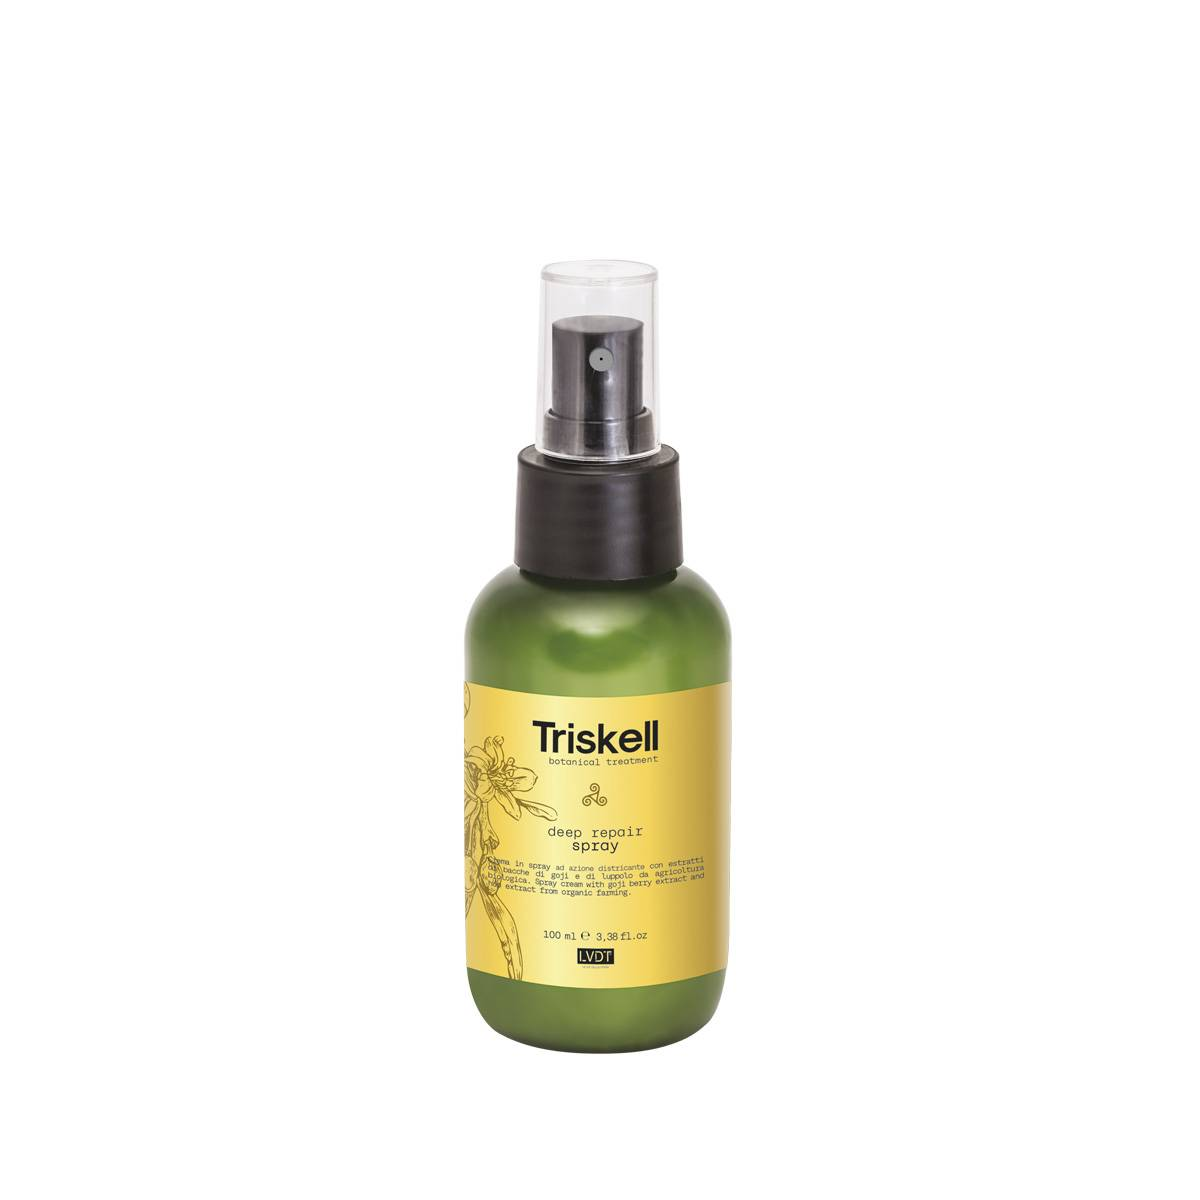 Deep Repair Spray 100ml Triskell Nuova Botanical Treatment